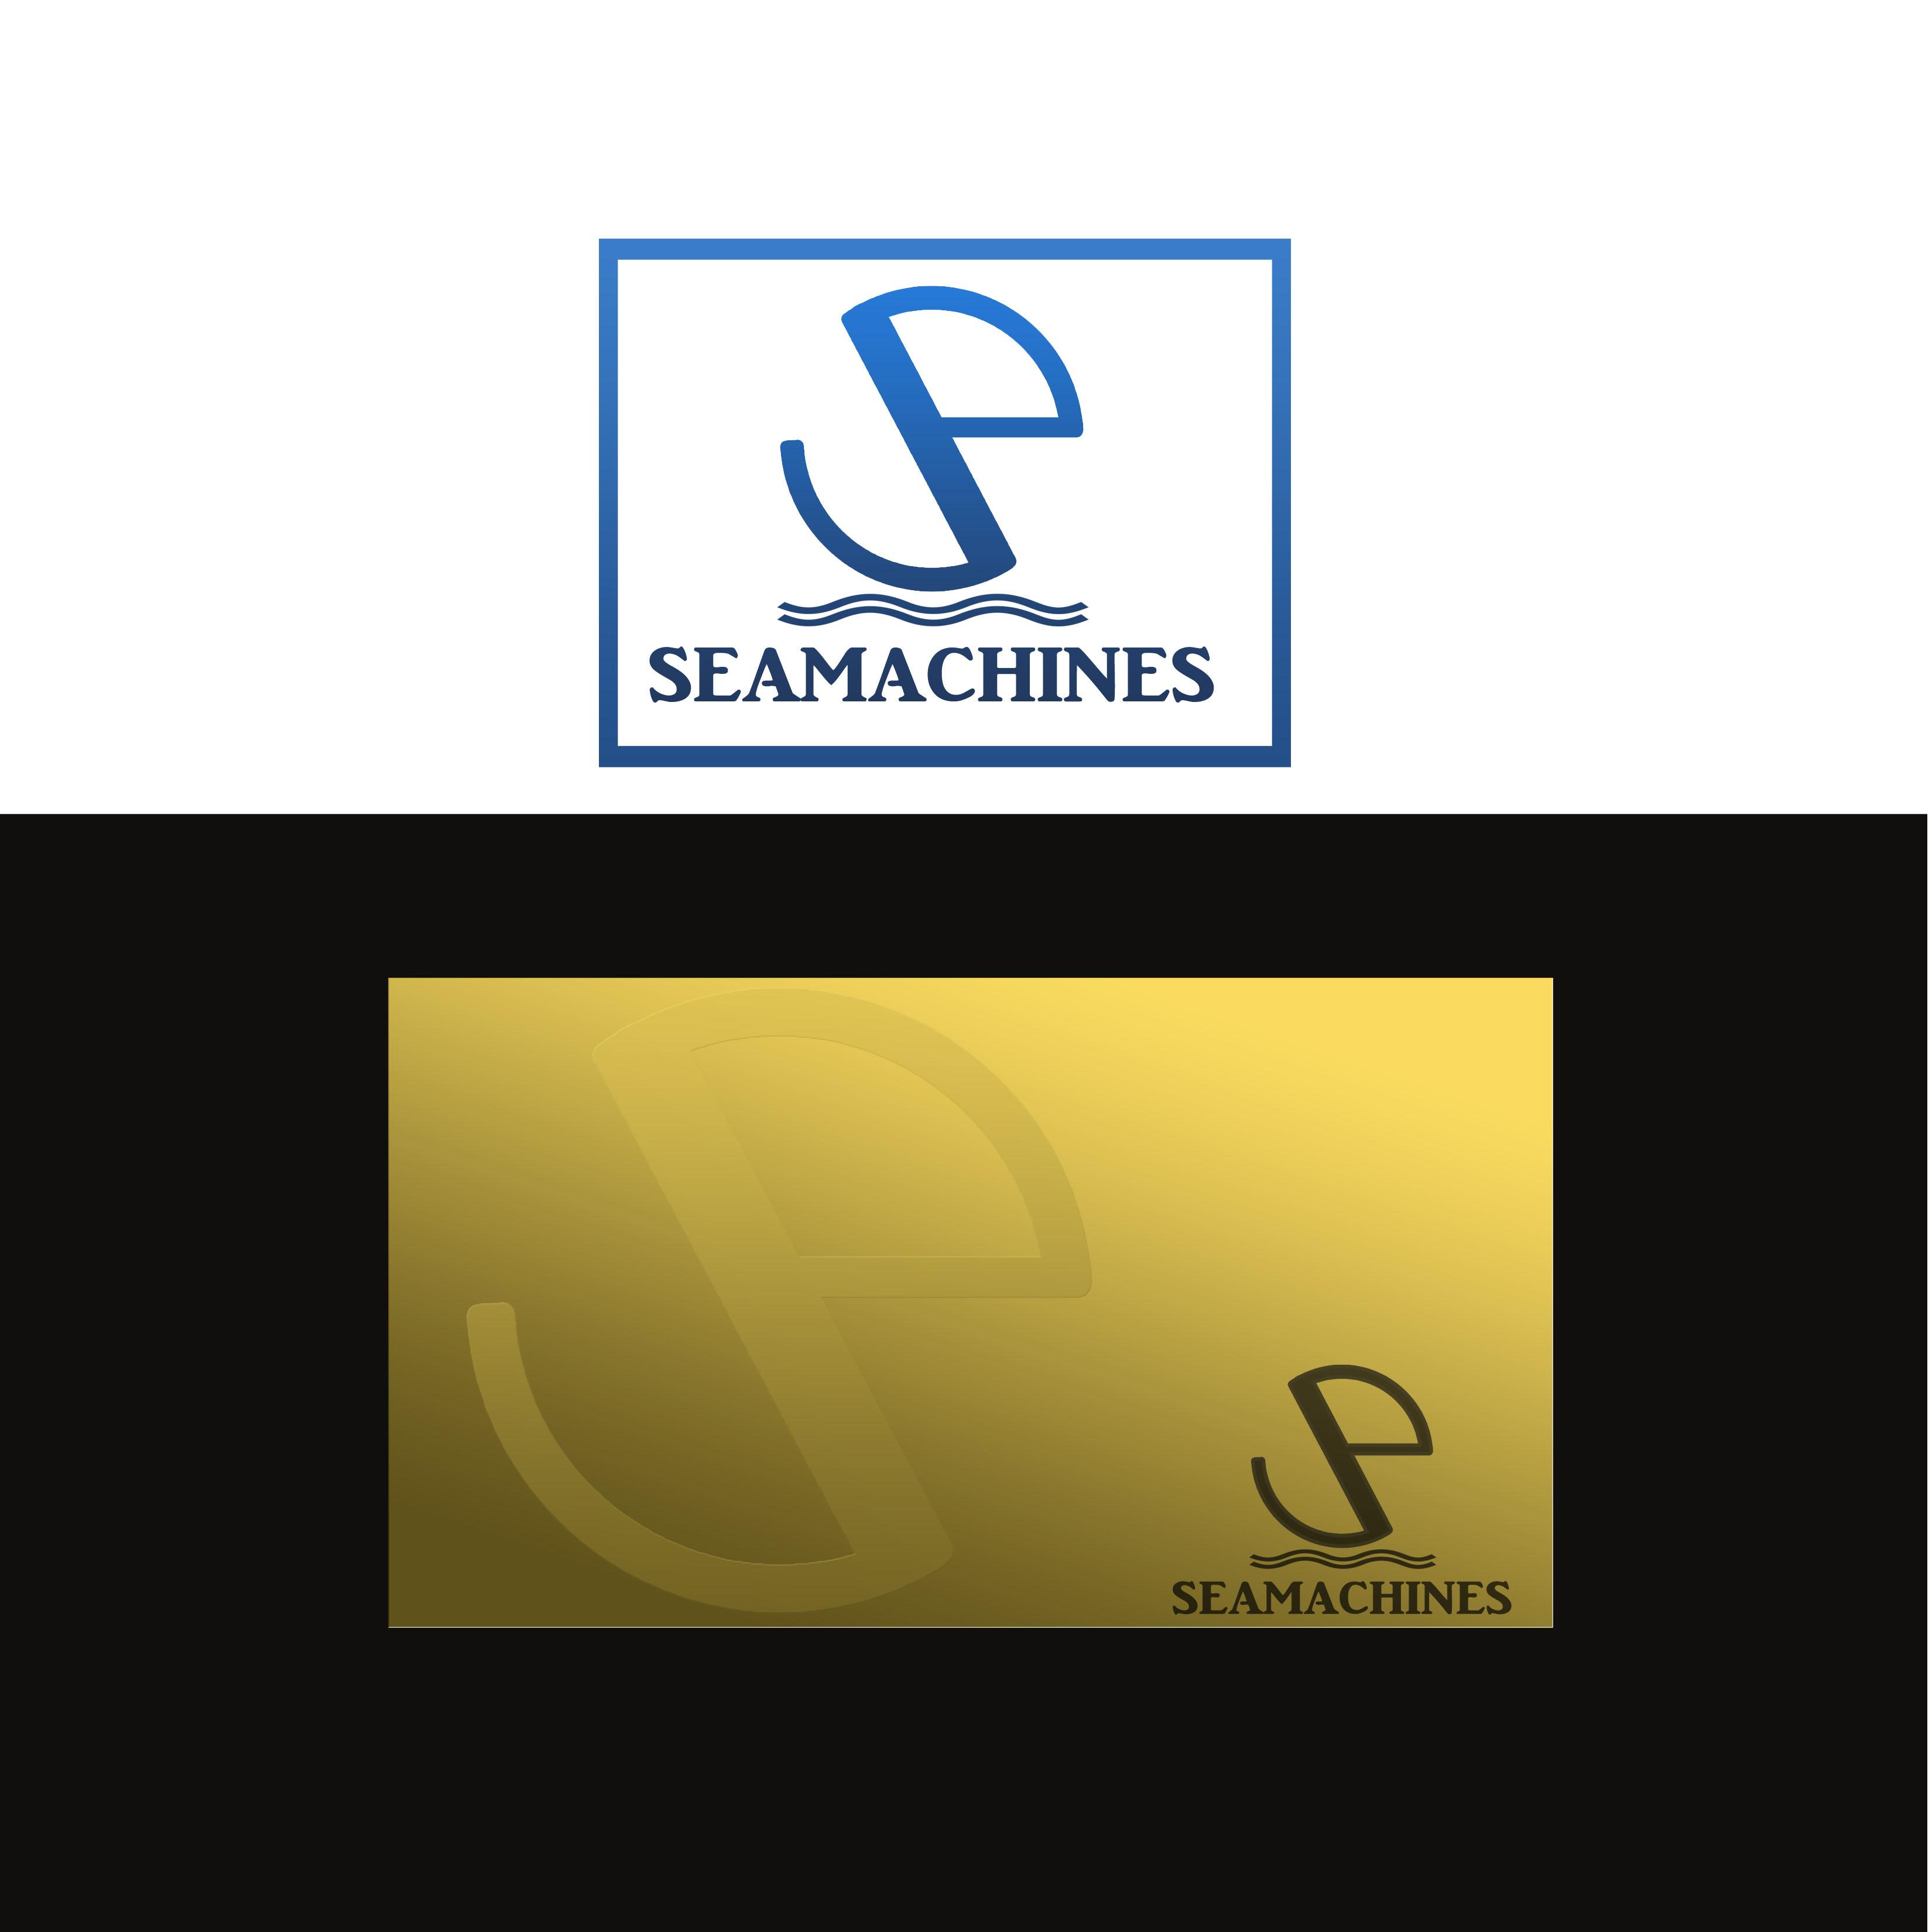 Logo Design by Allan Esclamado - Entry No. 78 in the Logo Design Contest Creative Logo Design for SeaMachines.